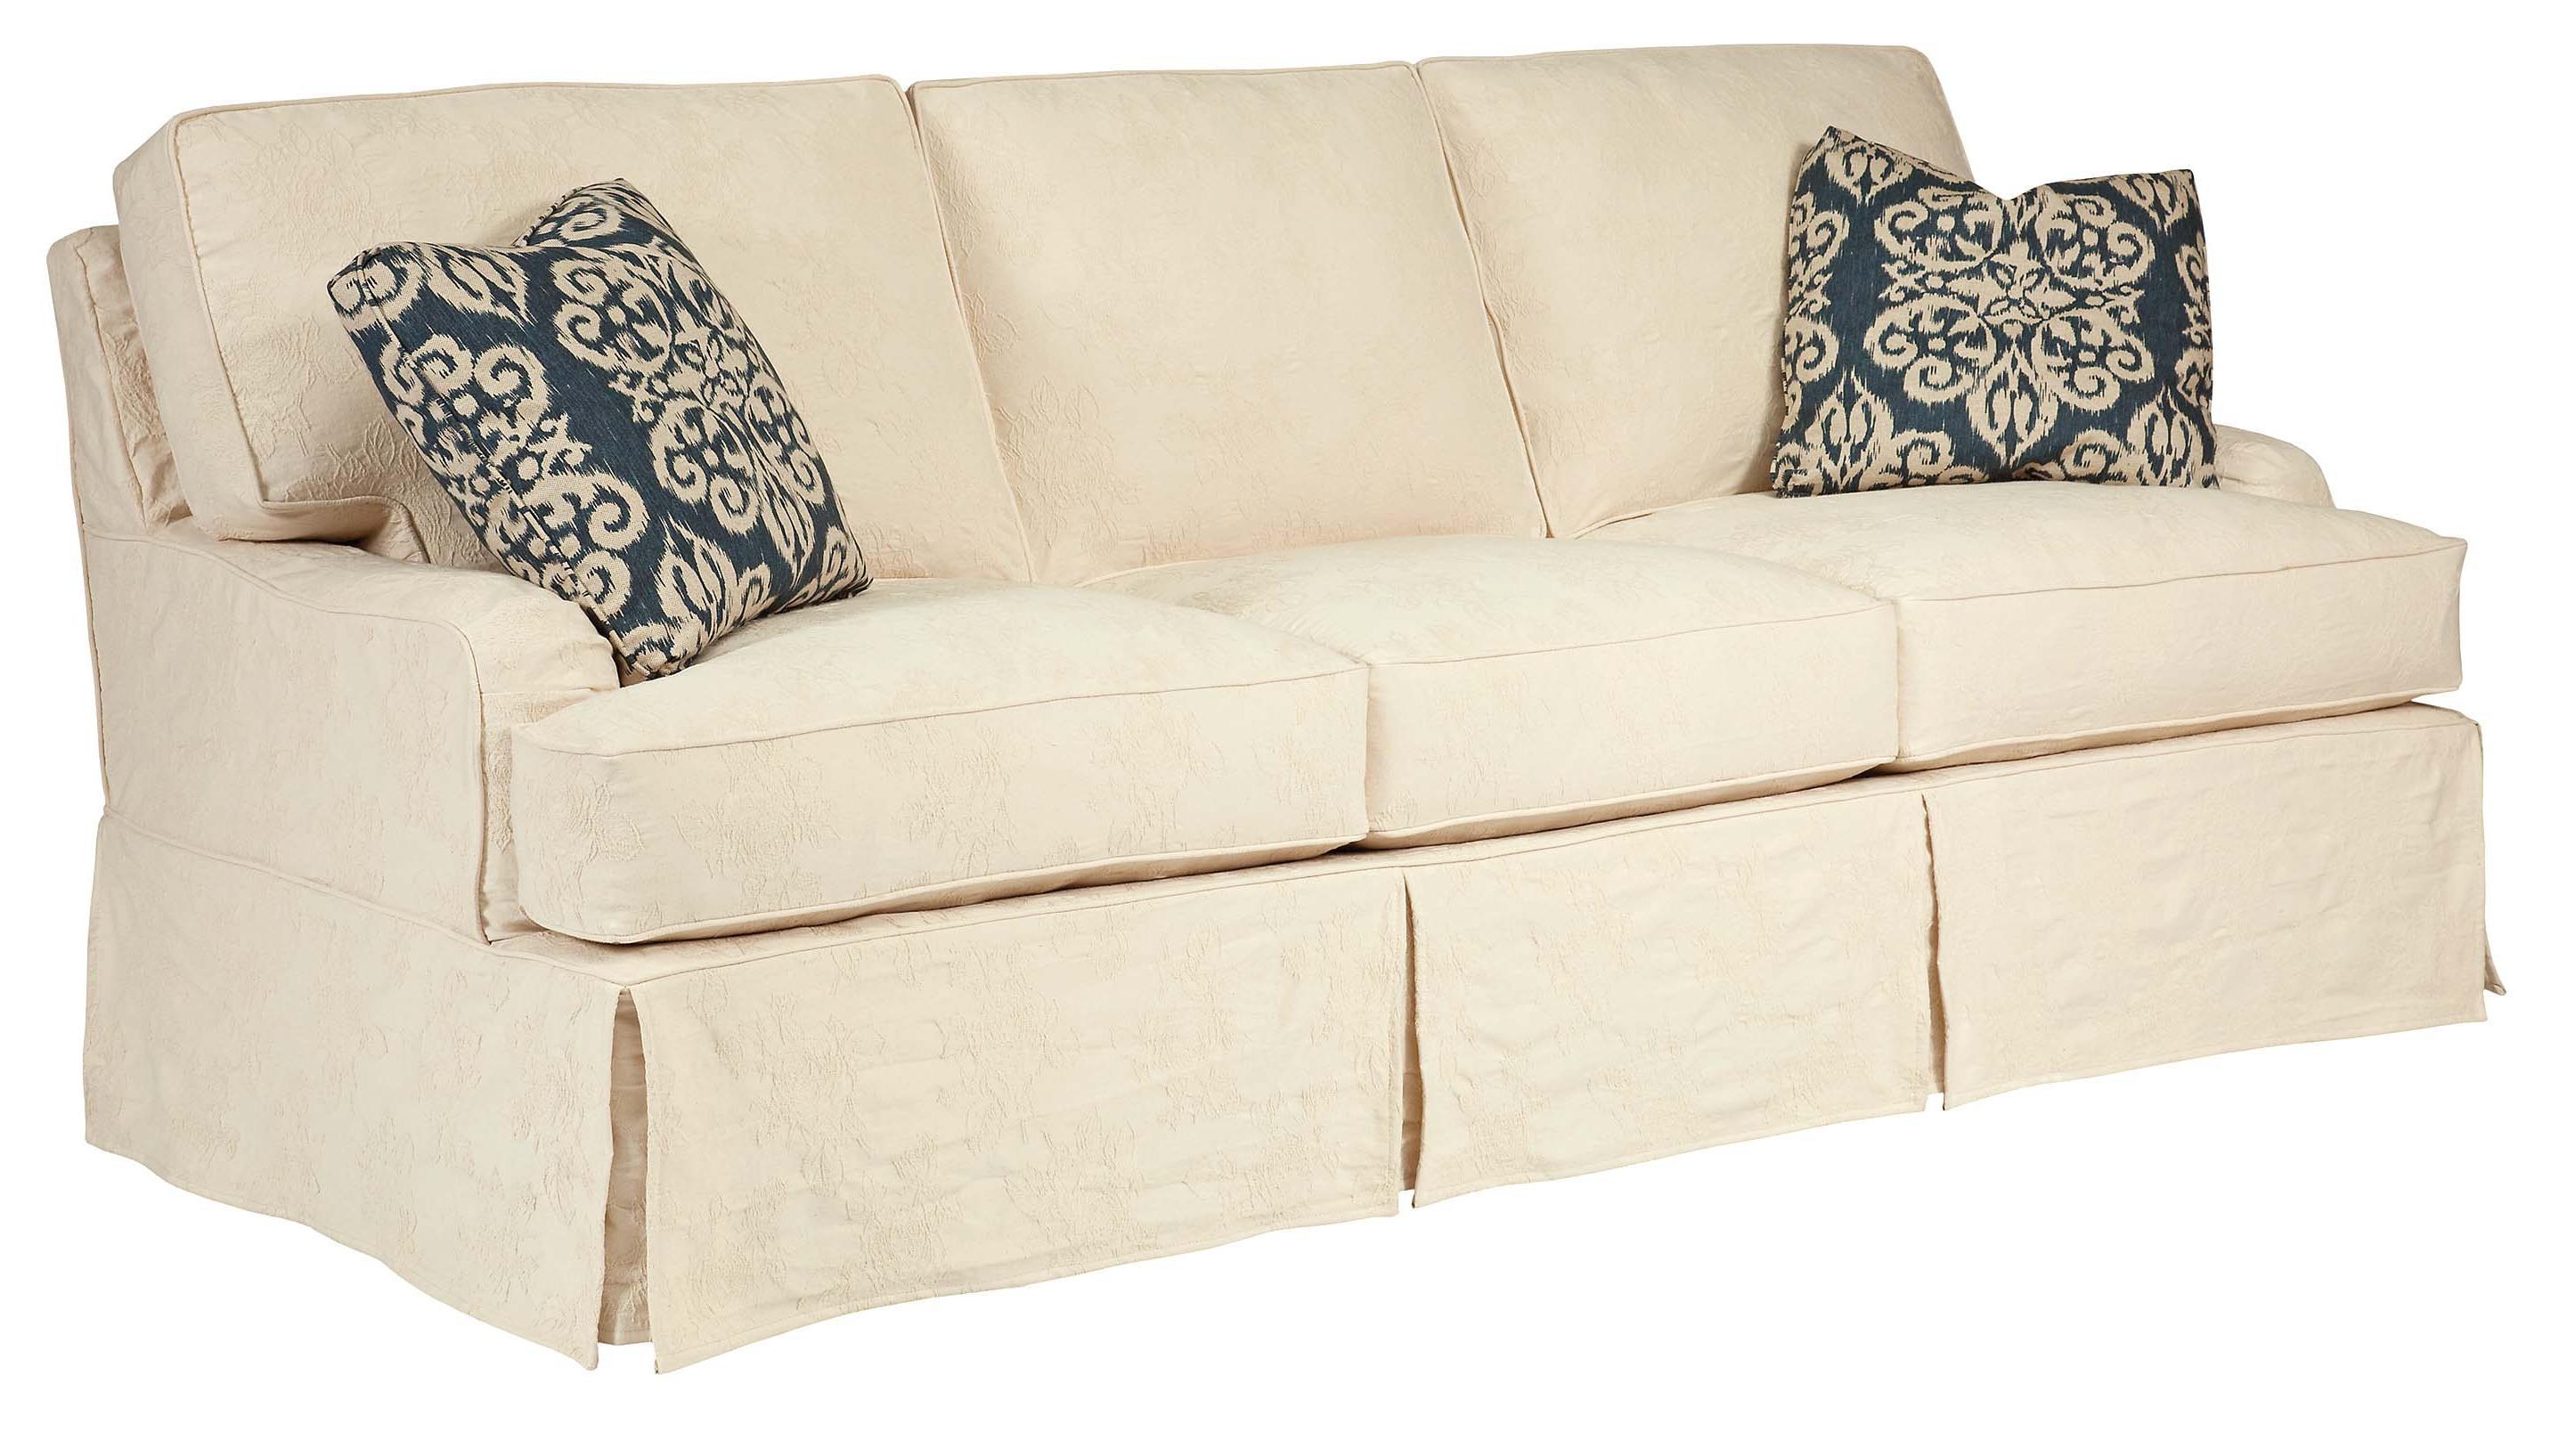 Homecoming Simone Slipcover Sofa by Kincaid Furniture at Johnny Janosik